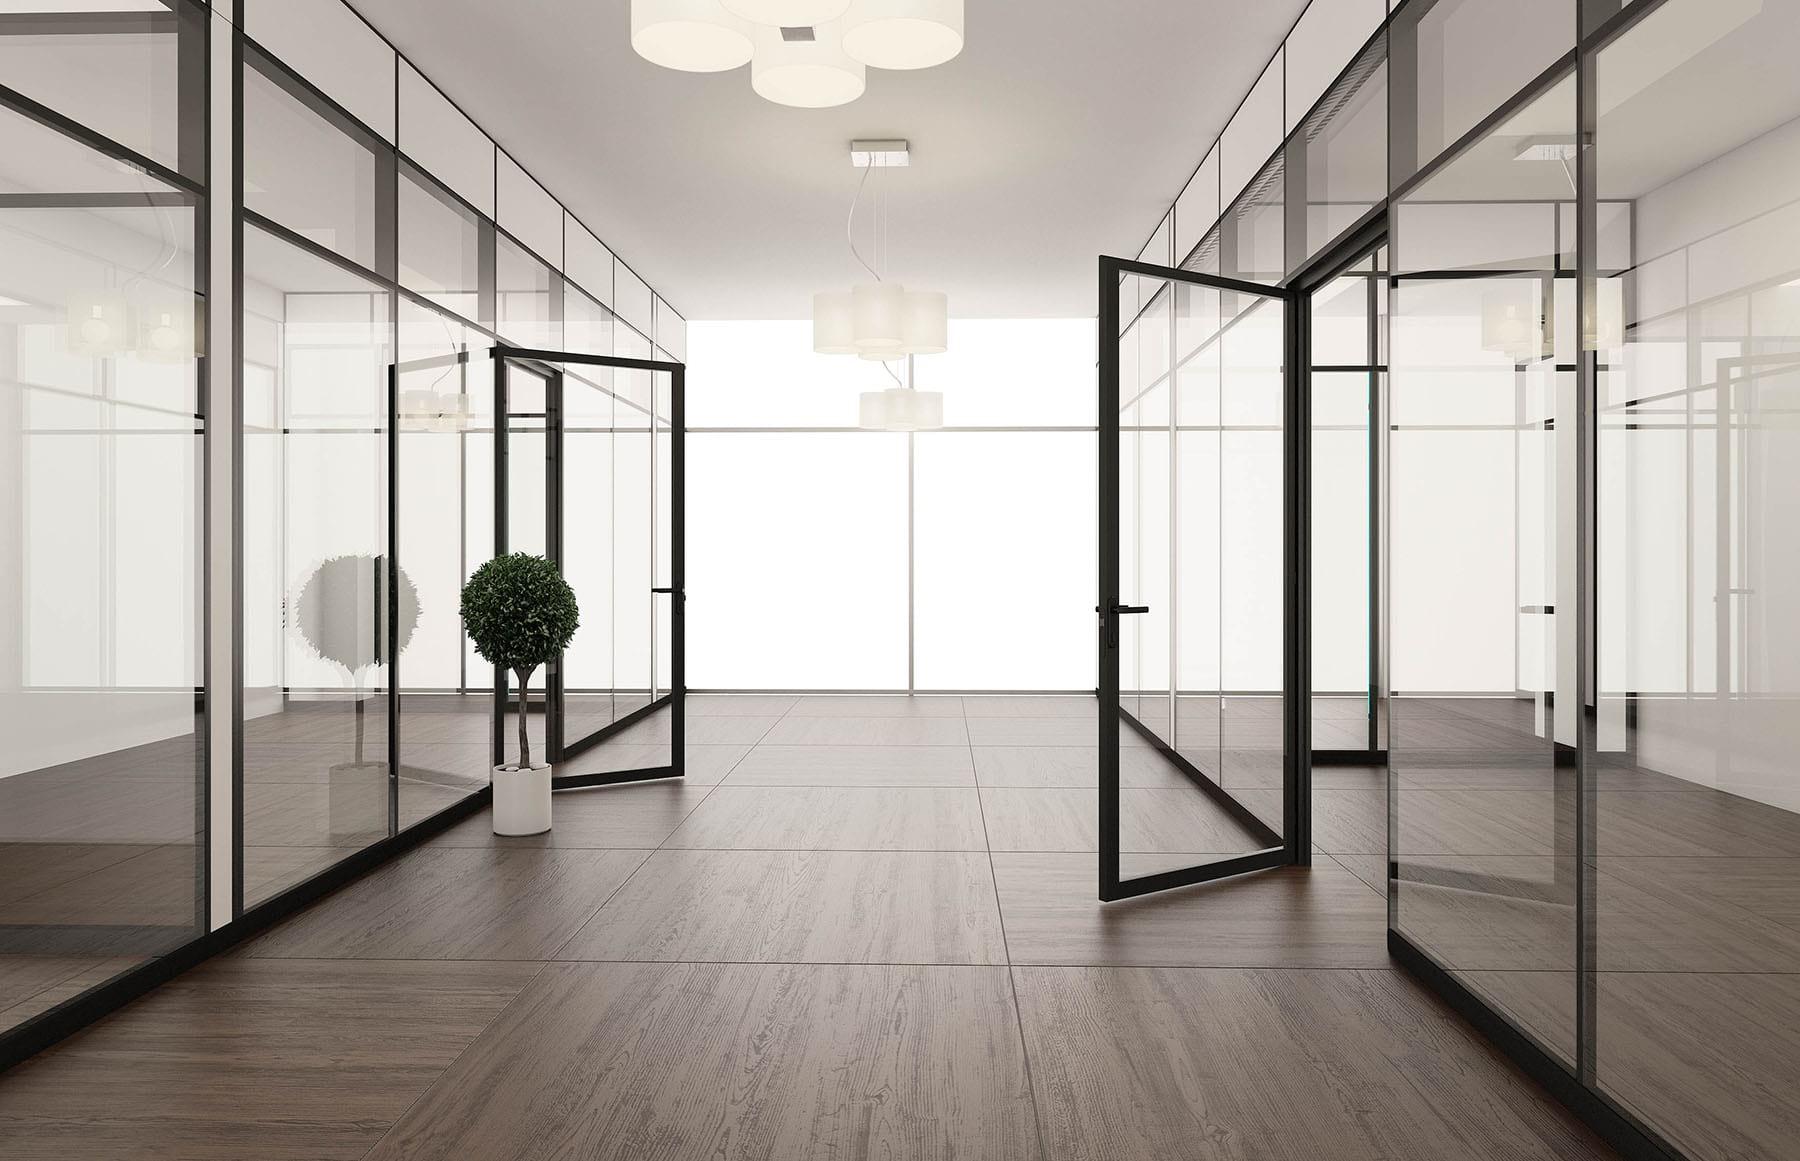 Pareti mobili milano per ufficio pareti attrezzate for Pareti mobili per ufficio